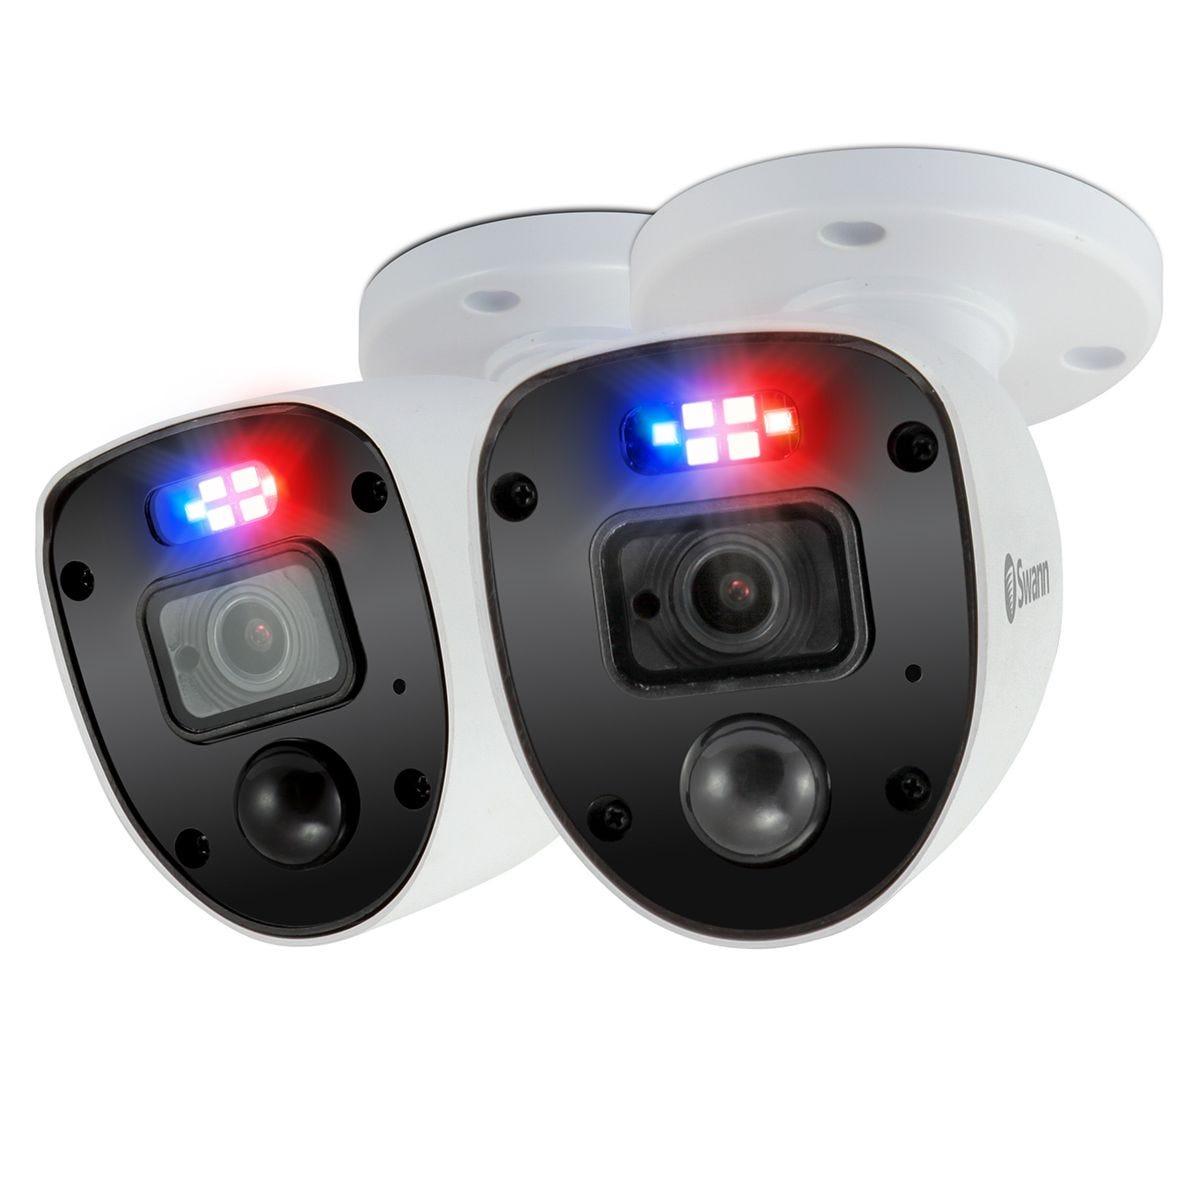 Swann Smart Enforcer LED Analogue CCTV Security Camera - 2 Pack